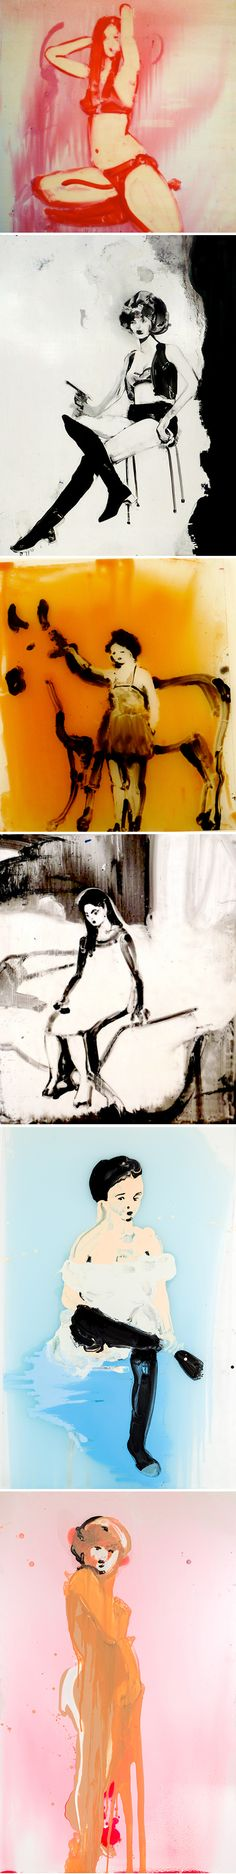 The Jealous Curator /// curated contemporary art /// ilona szalay